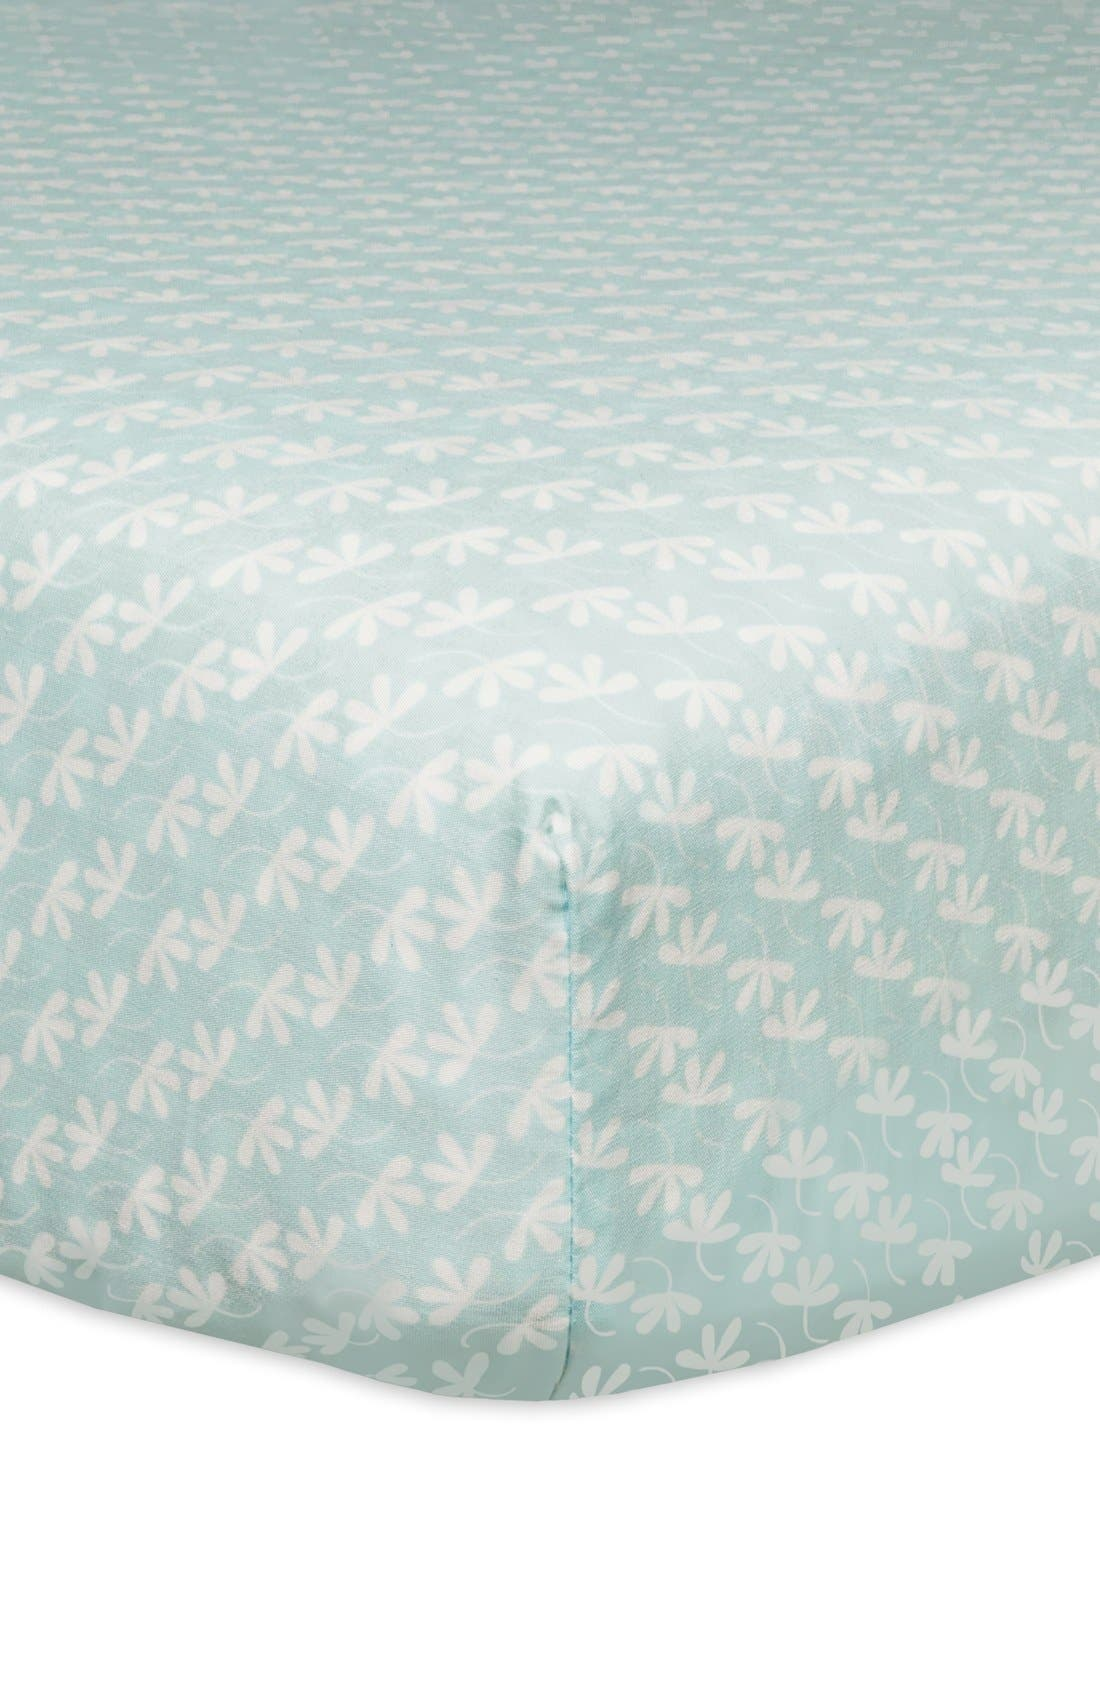 'Flora' Crib Sheet, Crib Skirt, Stroller Blanket & Wall Decals,                             Alternate thumbnail 2, color,                             Blue